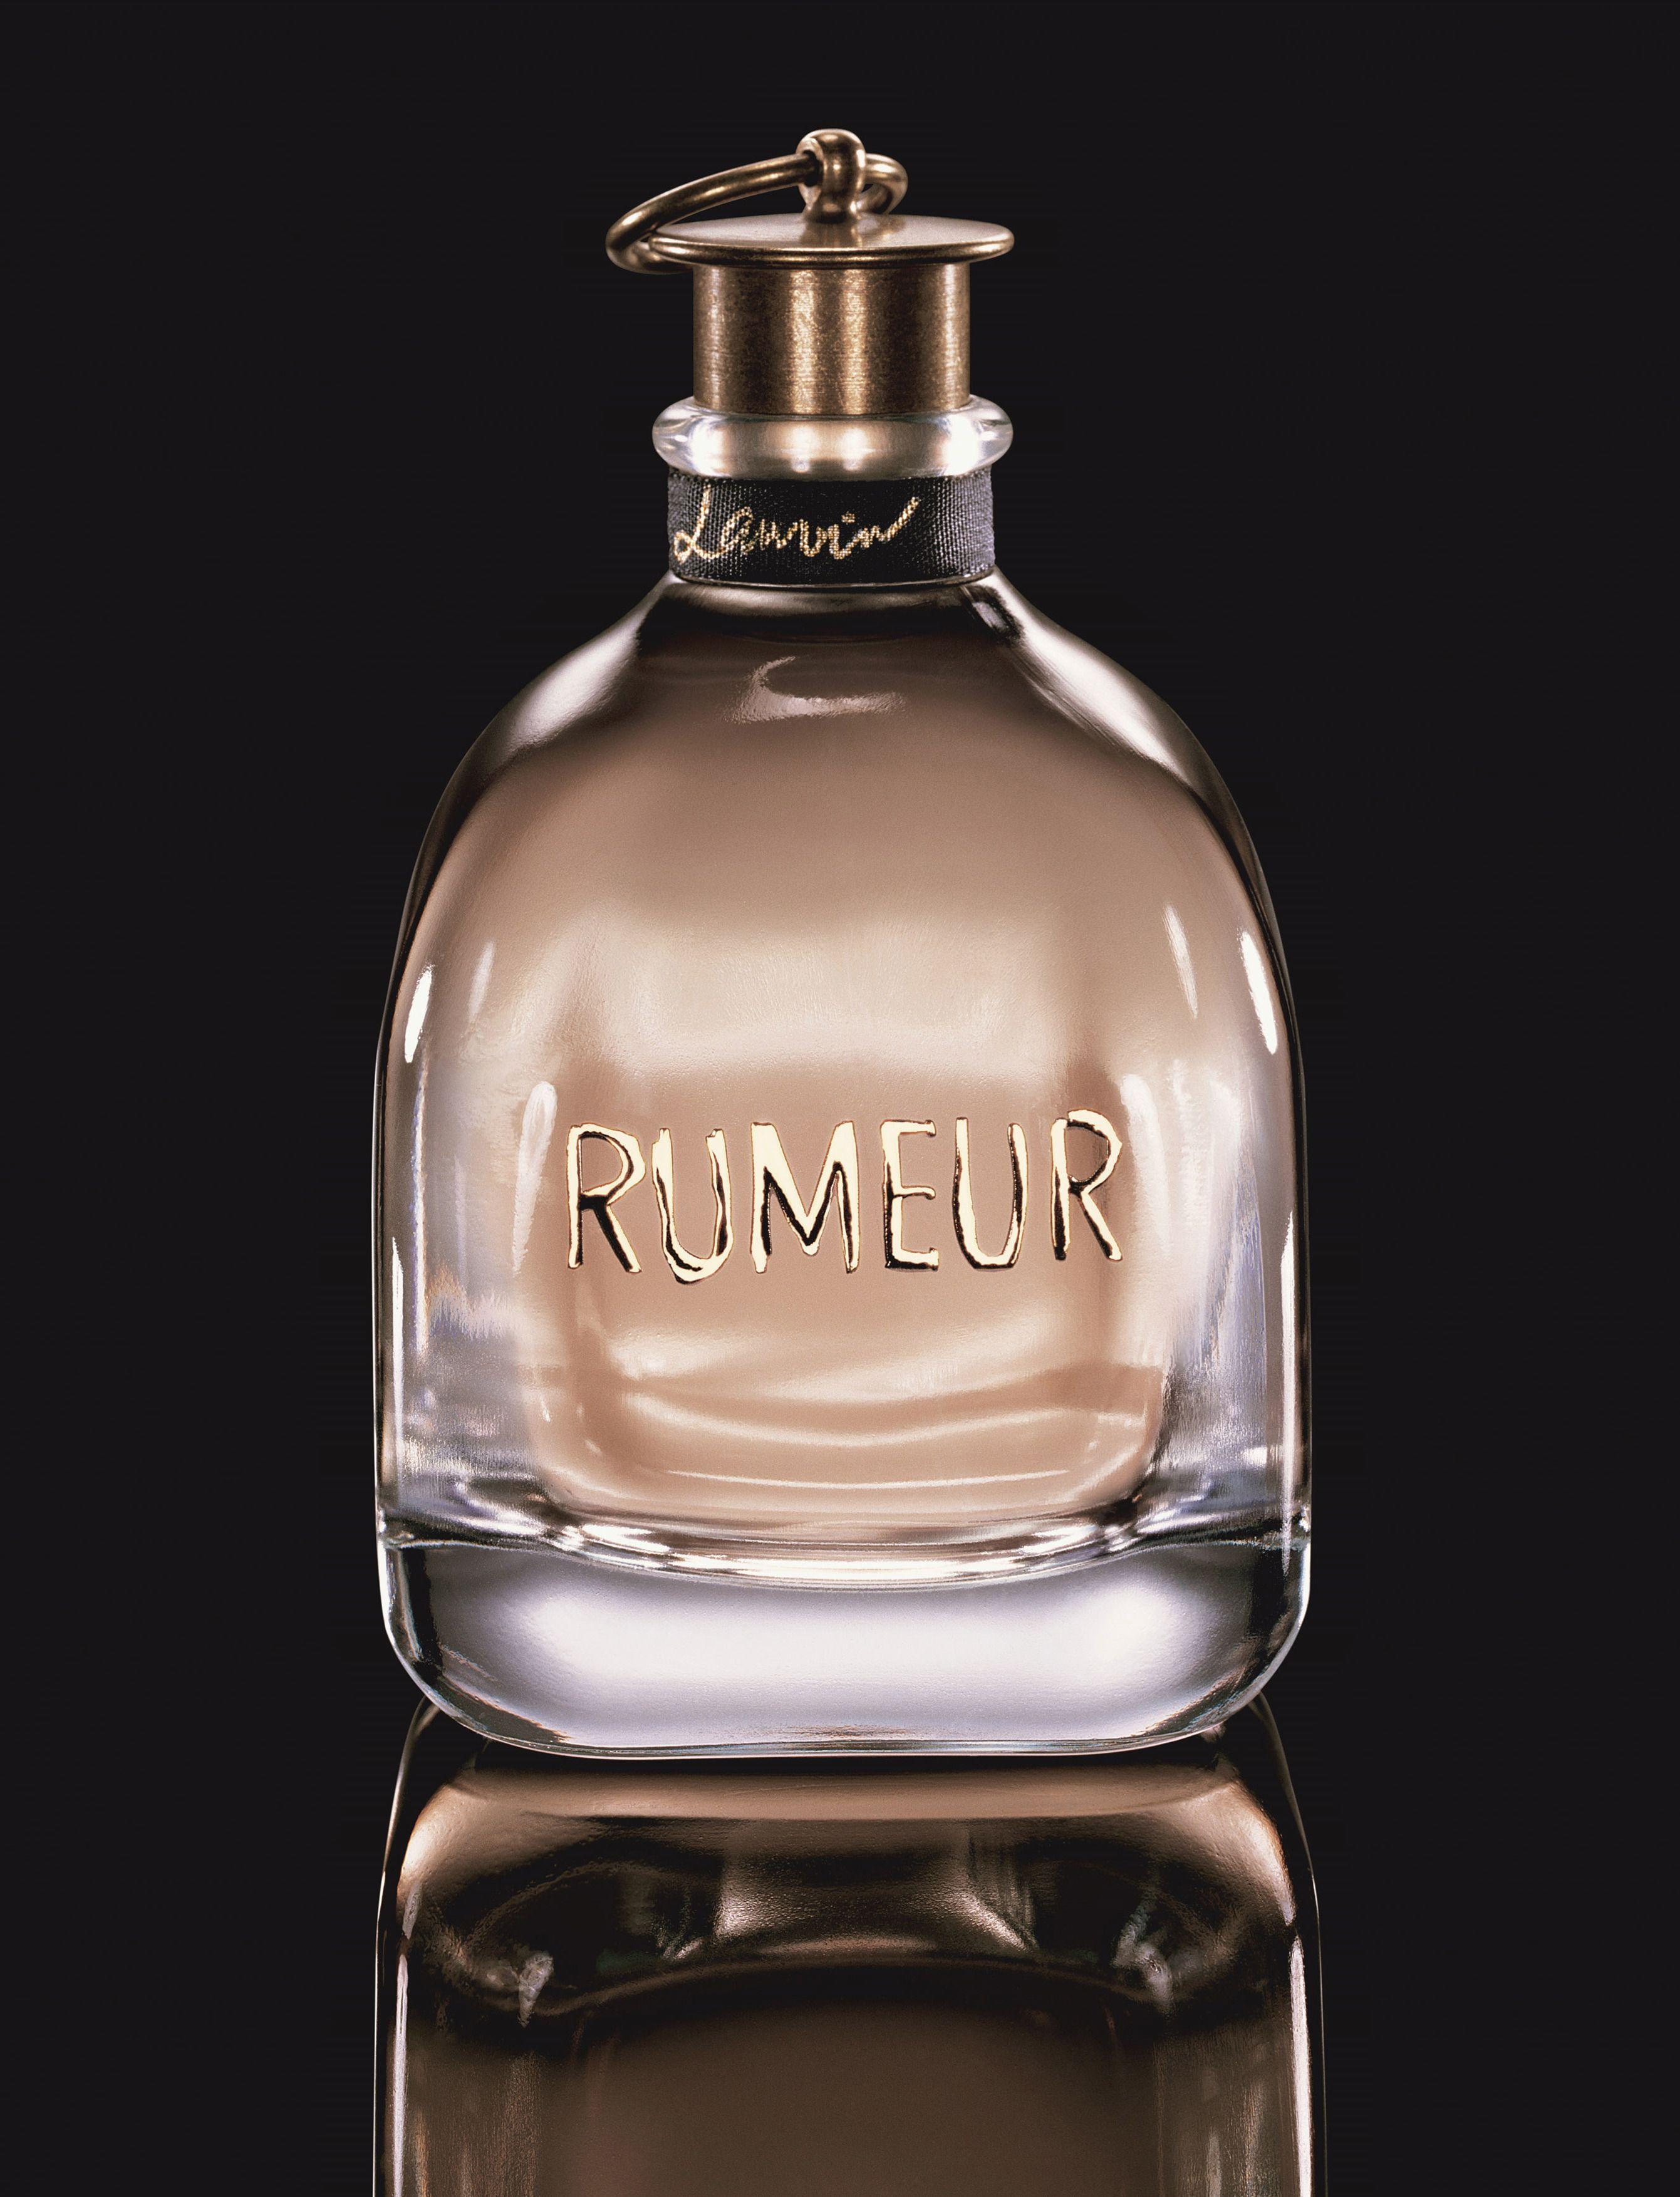 Lanvin - Rumeur